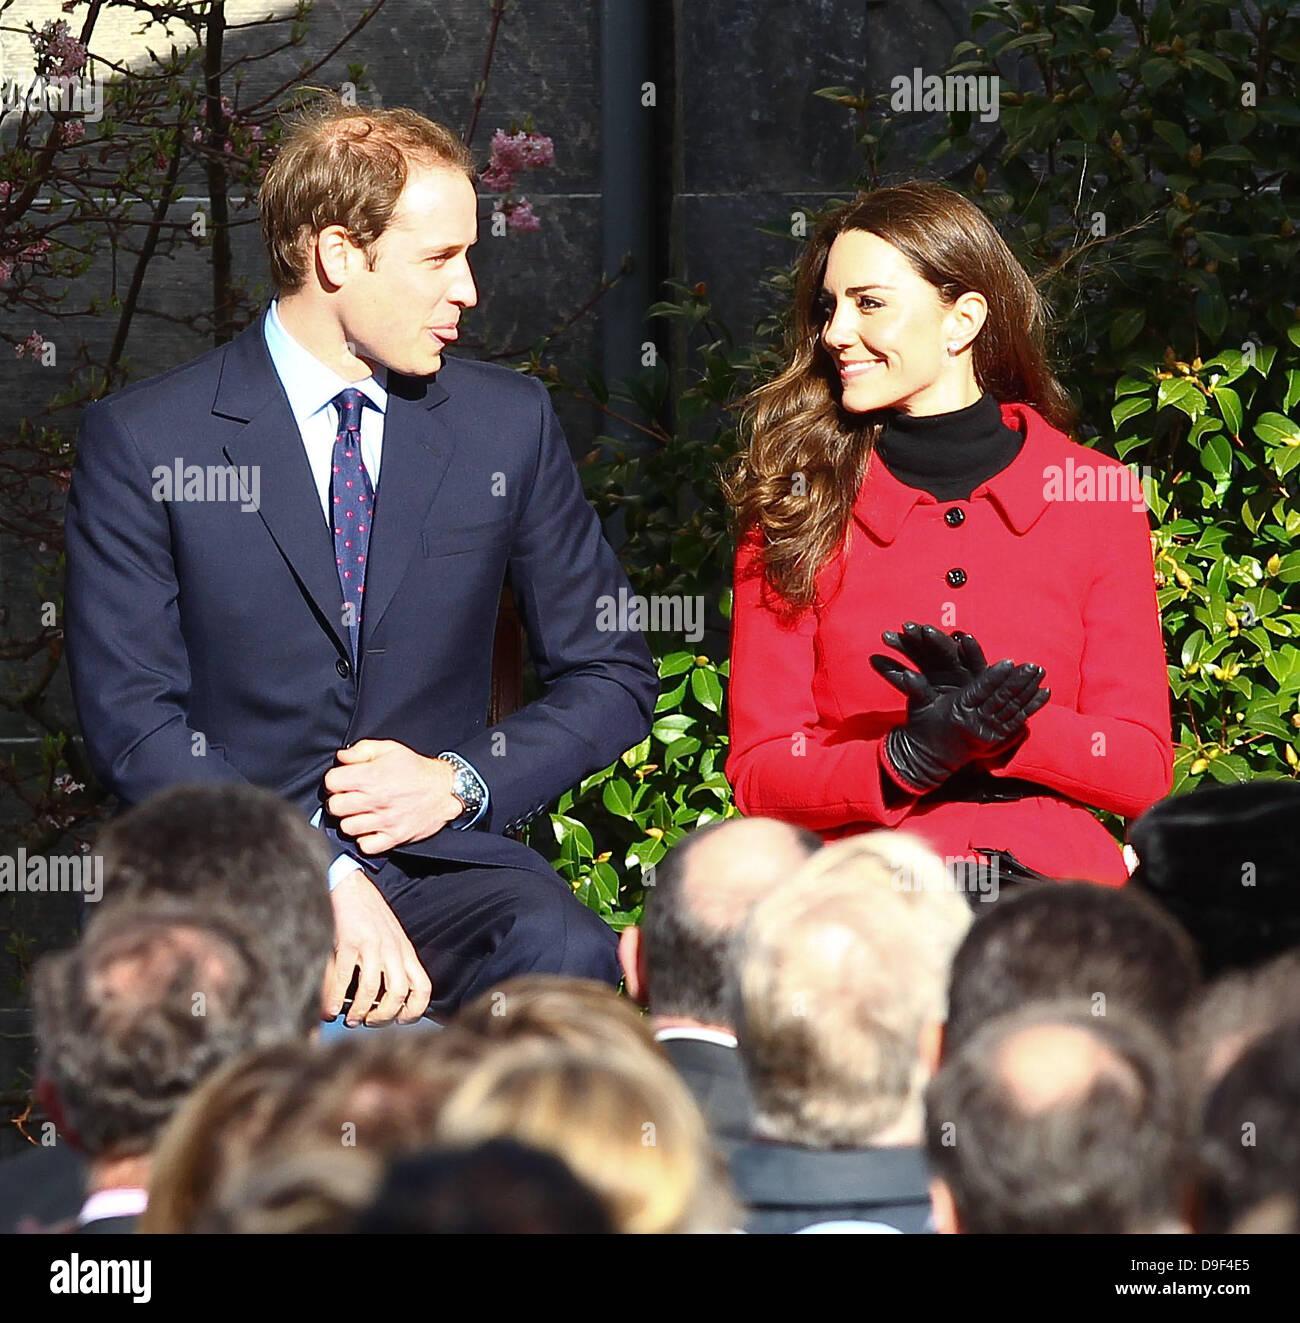 Prince William et Kate rencontres photos Far Cry 4 démo Matchmaking